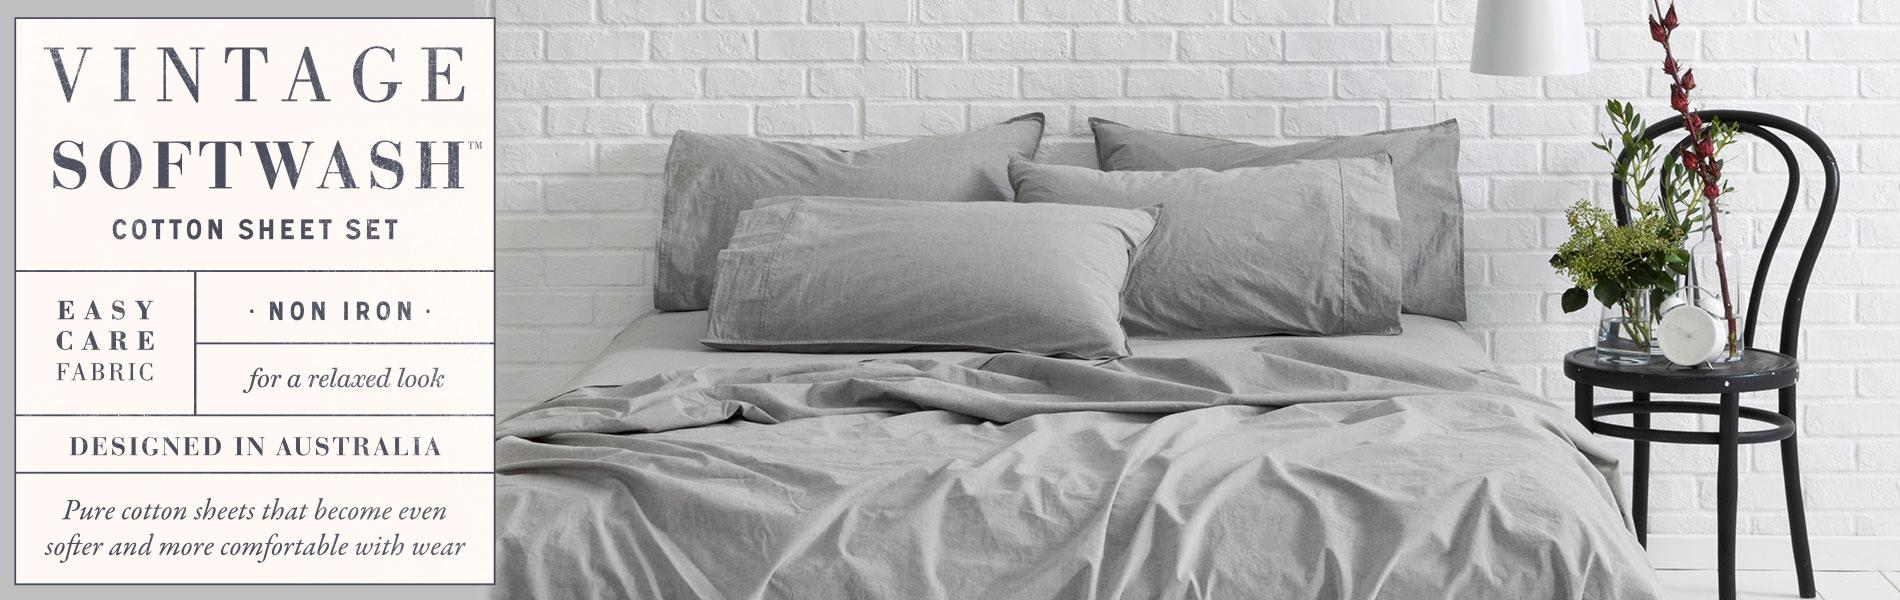 Vintage Softwash Cotton Sheet Set